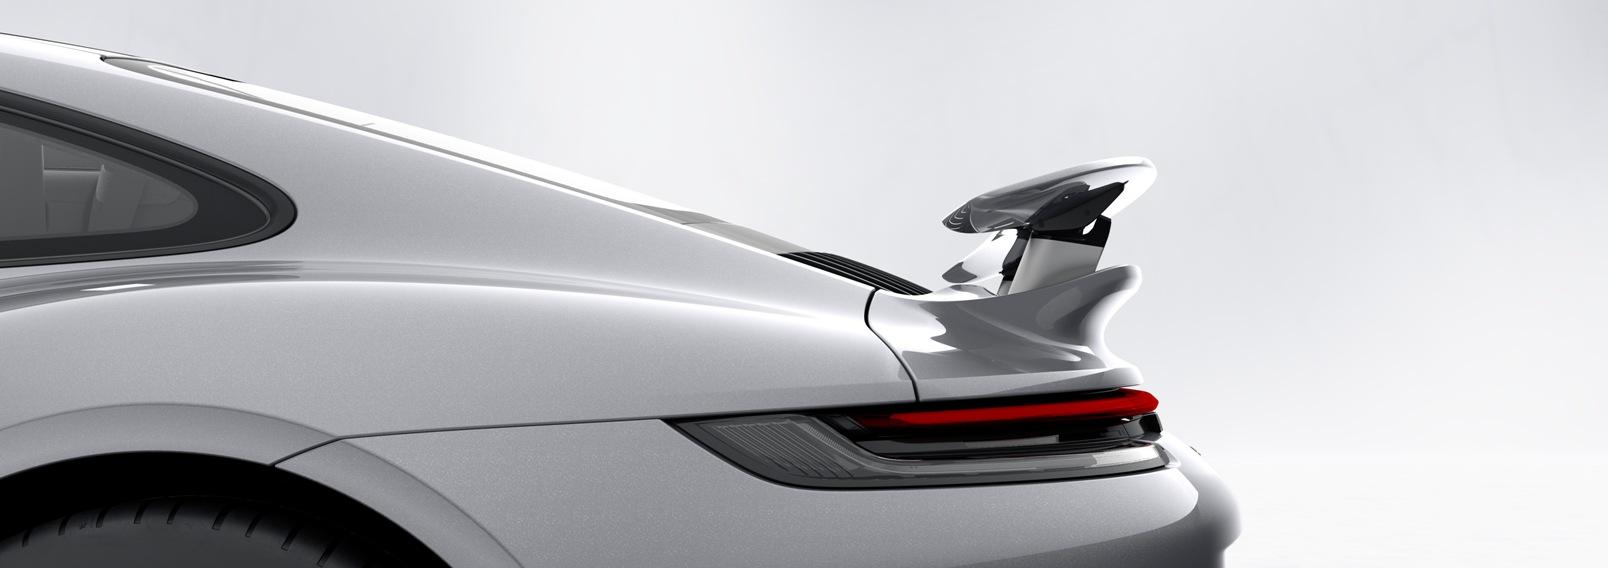 Aerodinámica Porsche 911 Turbo S (9)